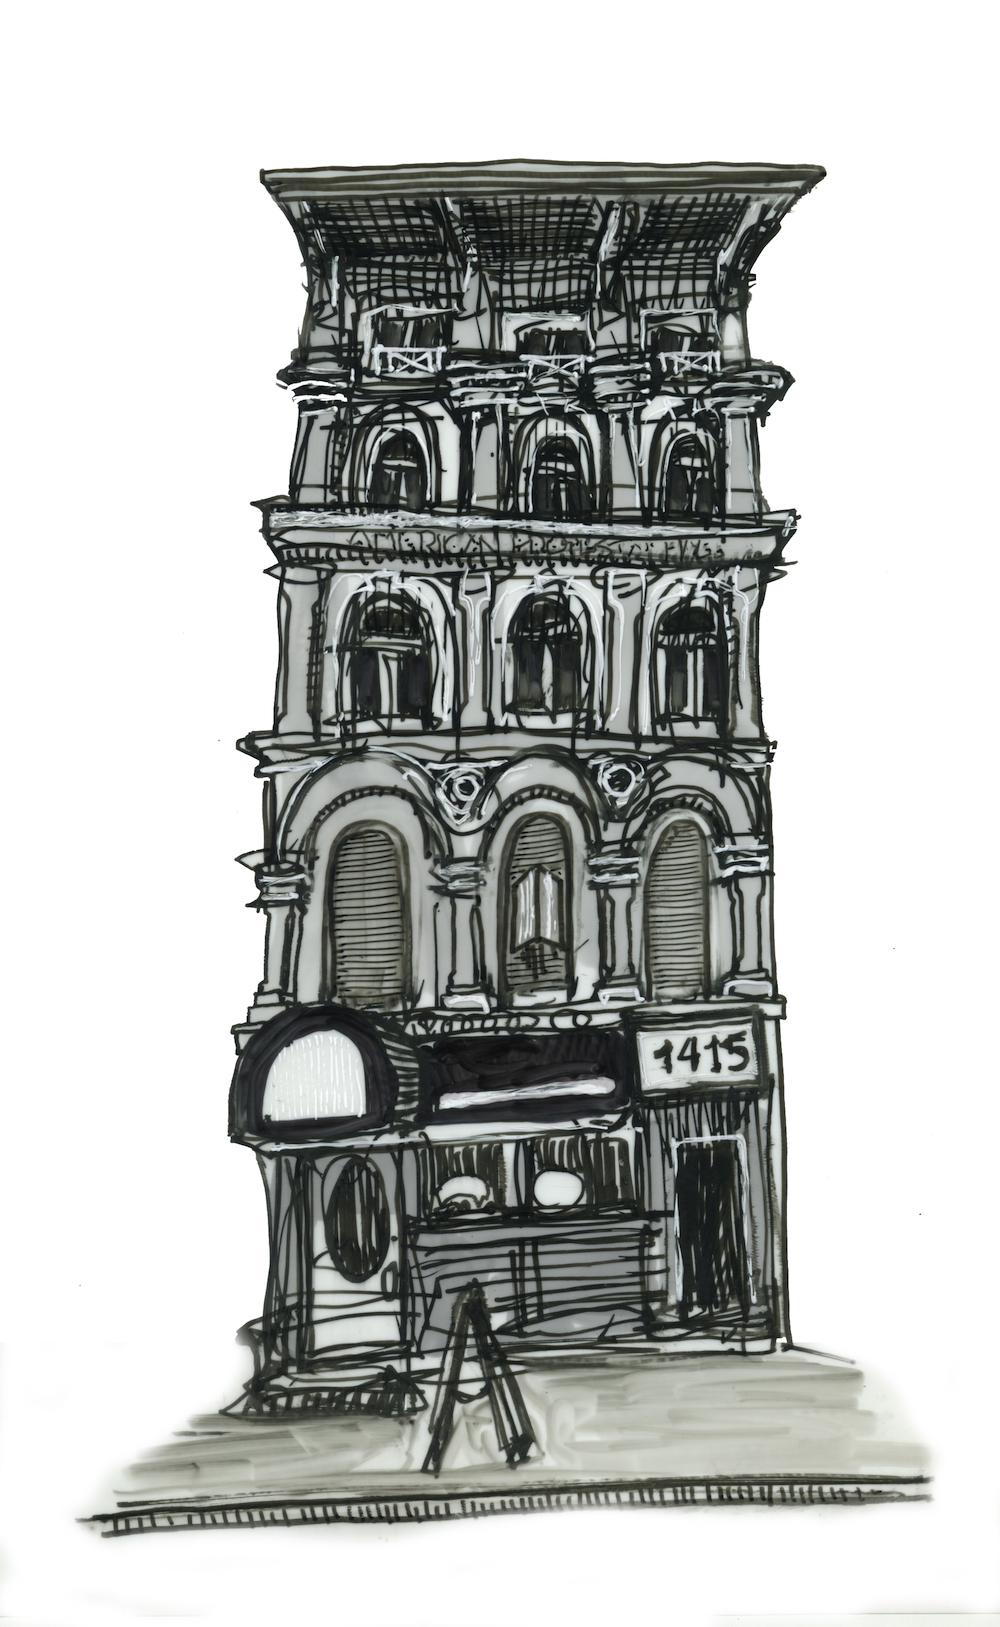 Unlisted Philadelphia: American Protestant Hall